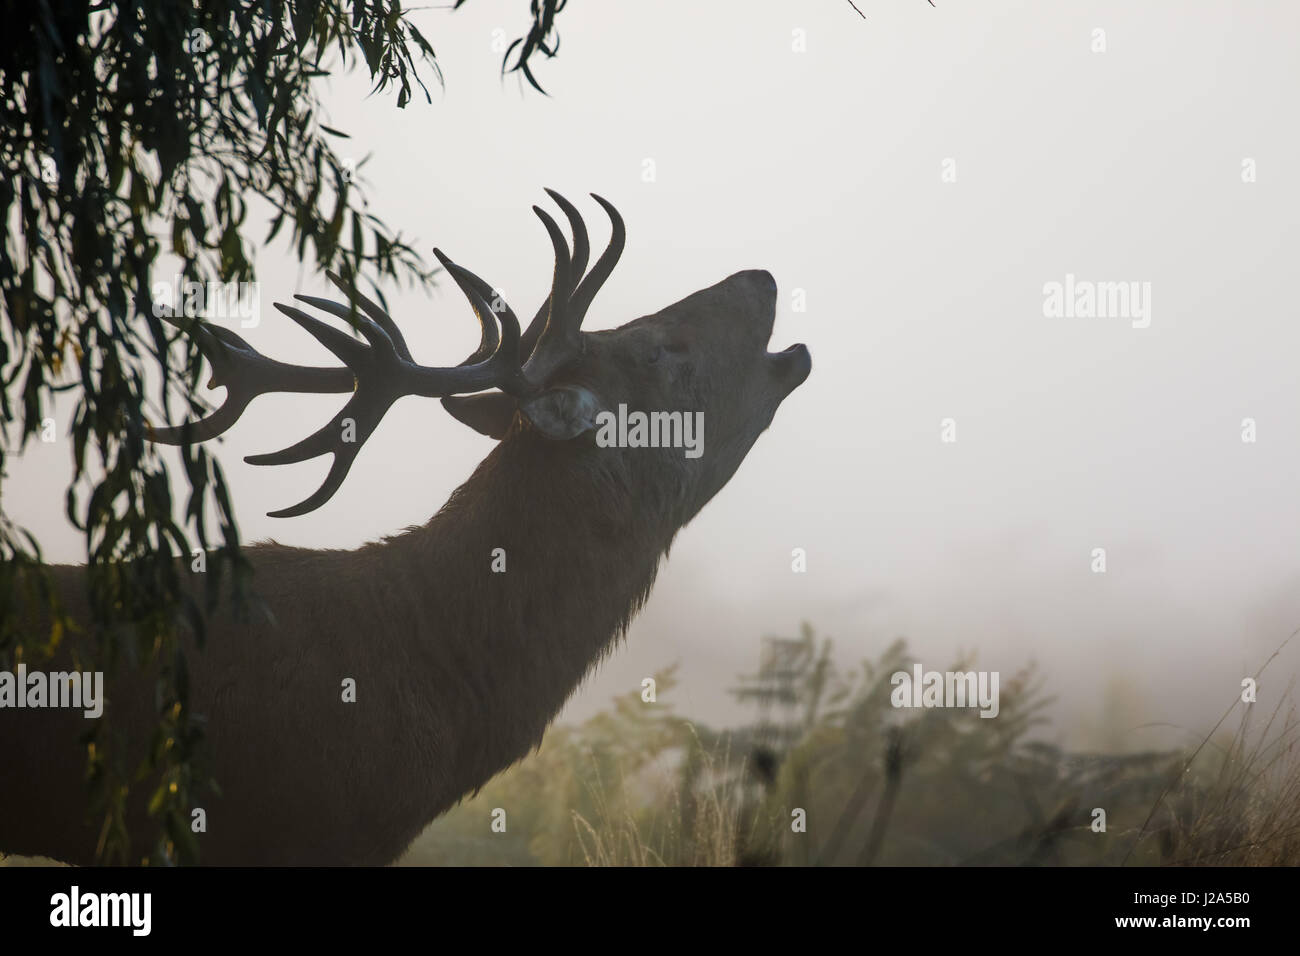 Red Deer rut stag (Cervus elaphus) bellowing or roaring on a misty morning - Stock Image